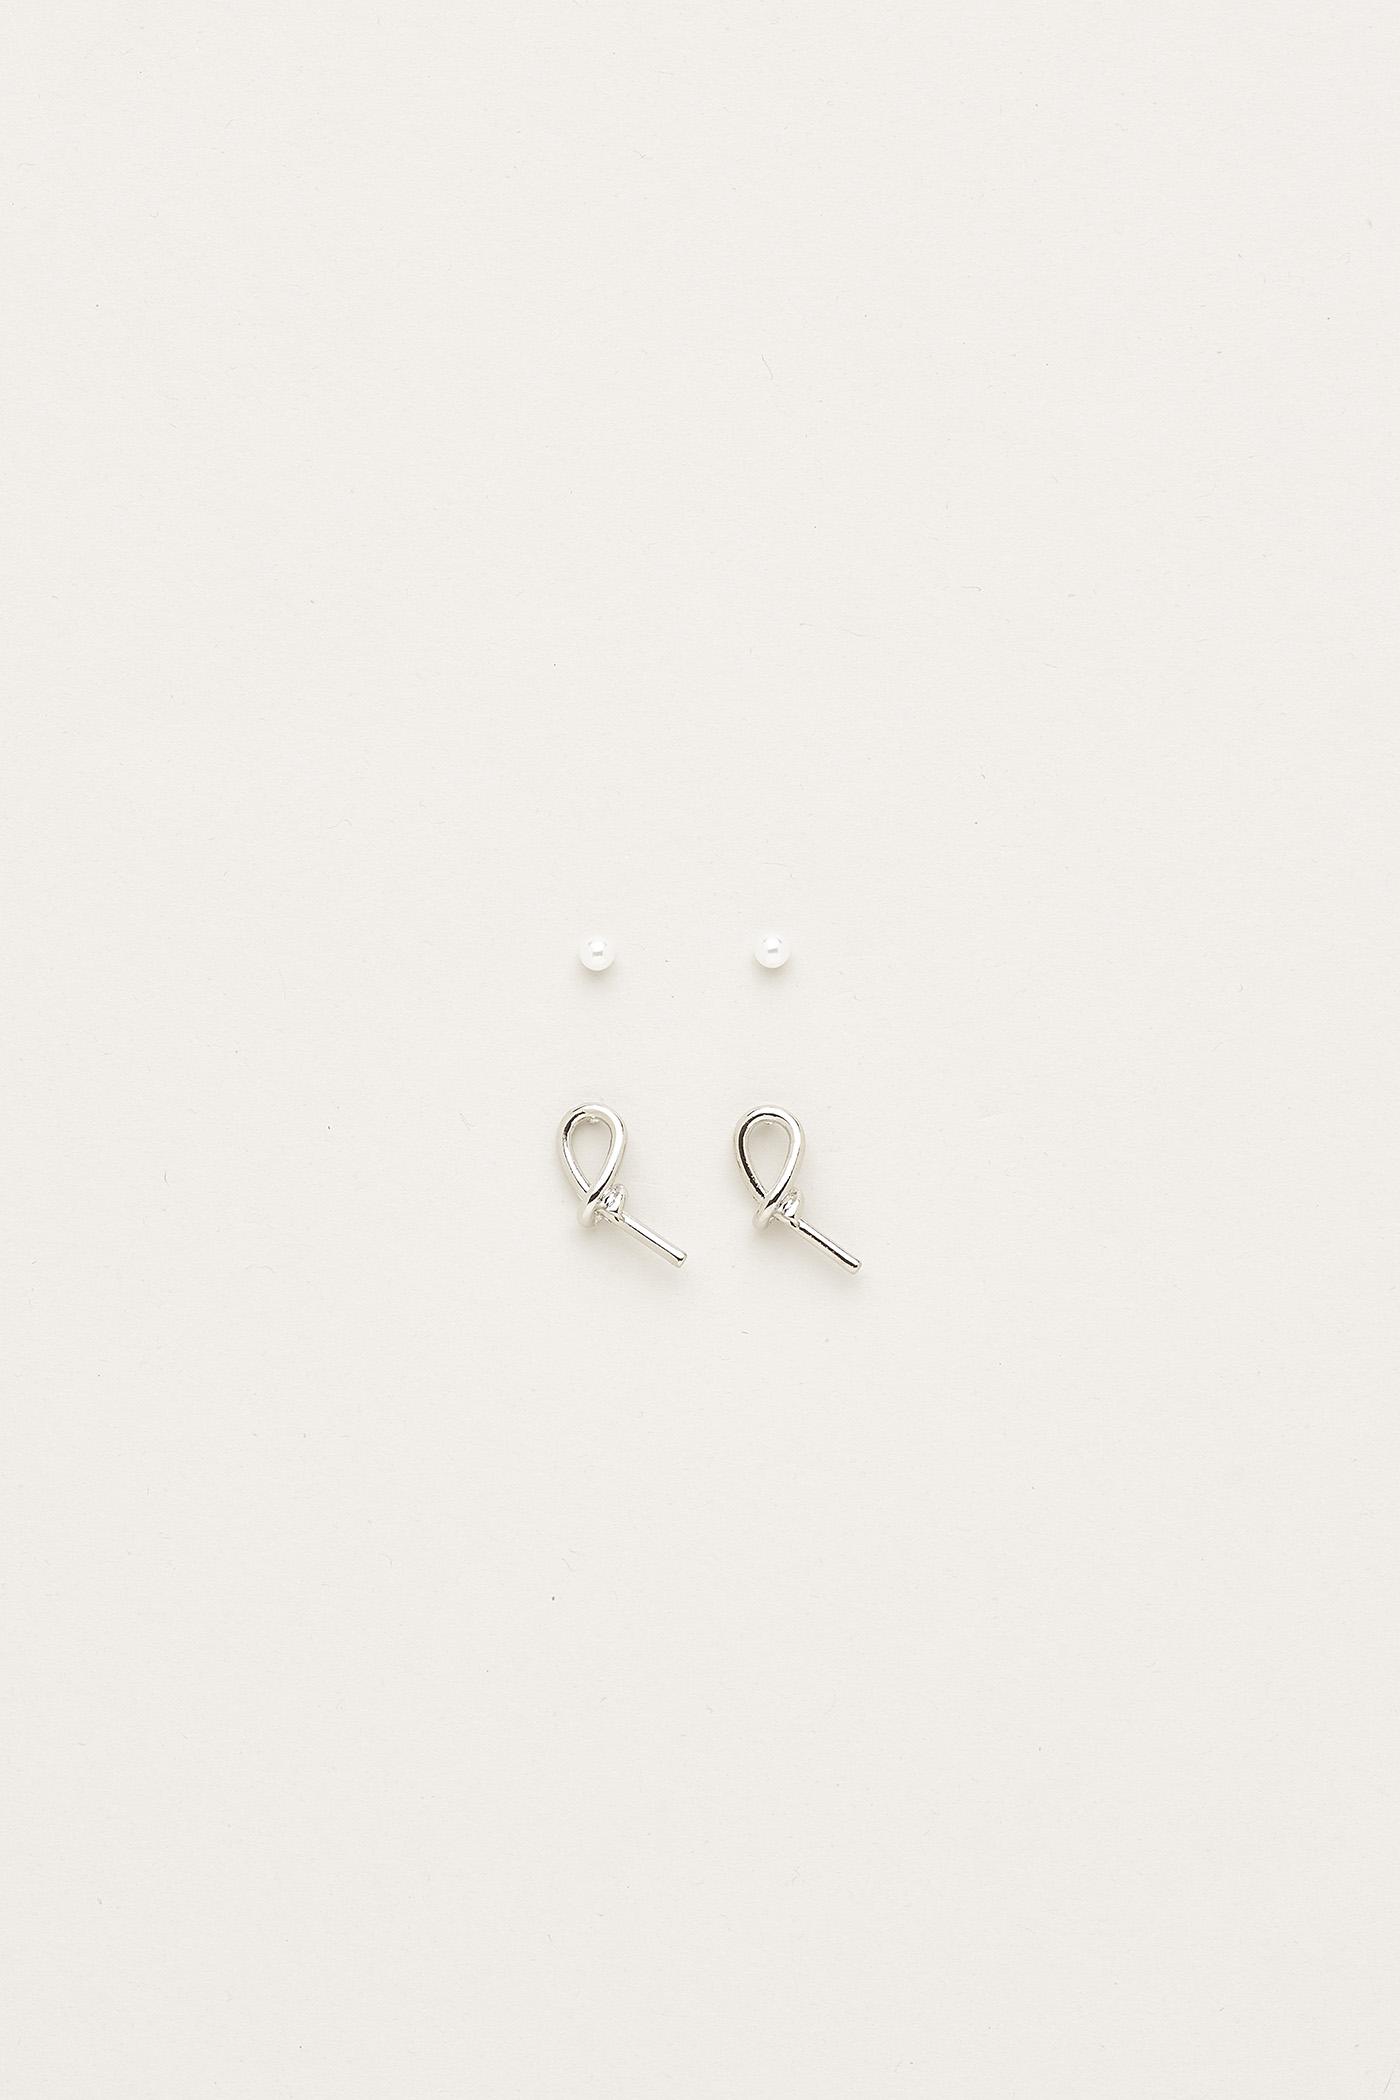 Gisella Knot Ear Studs